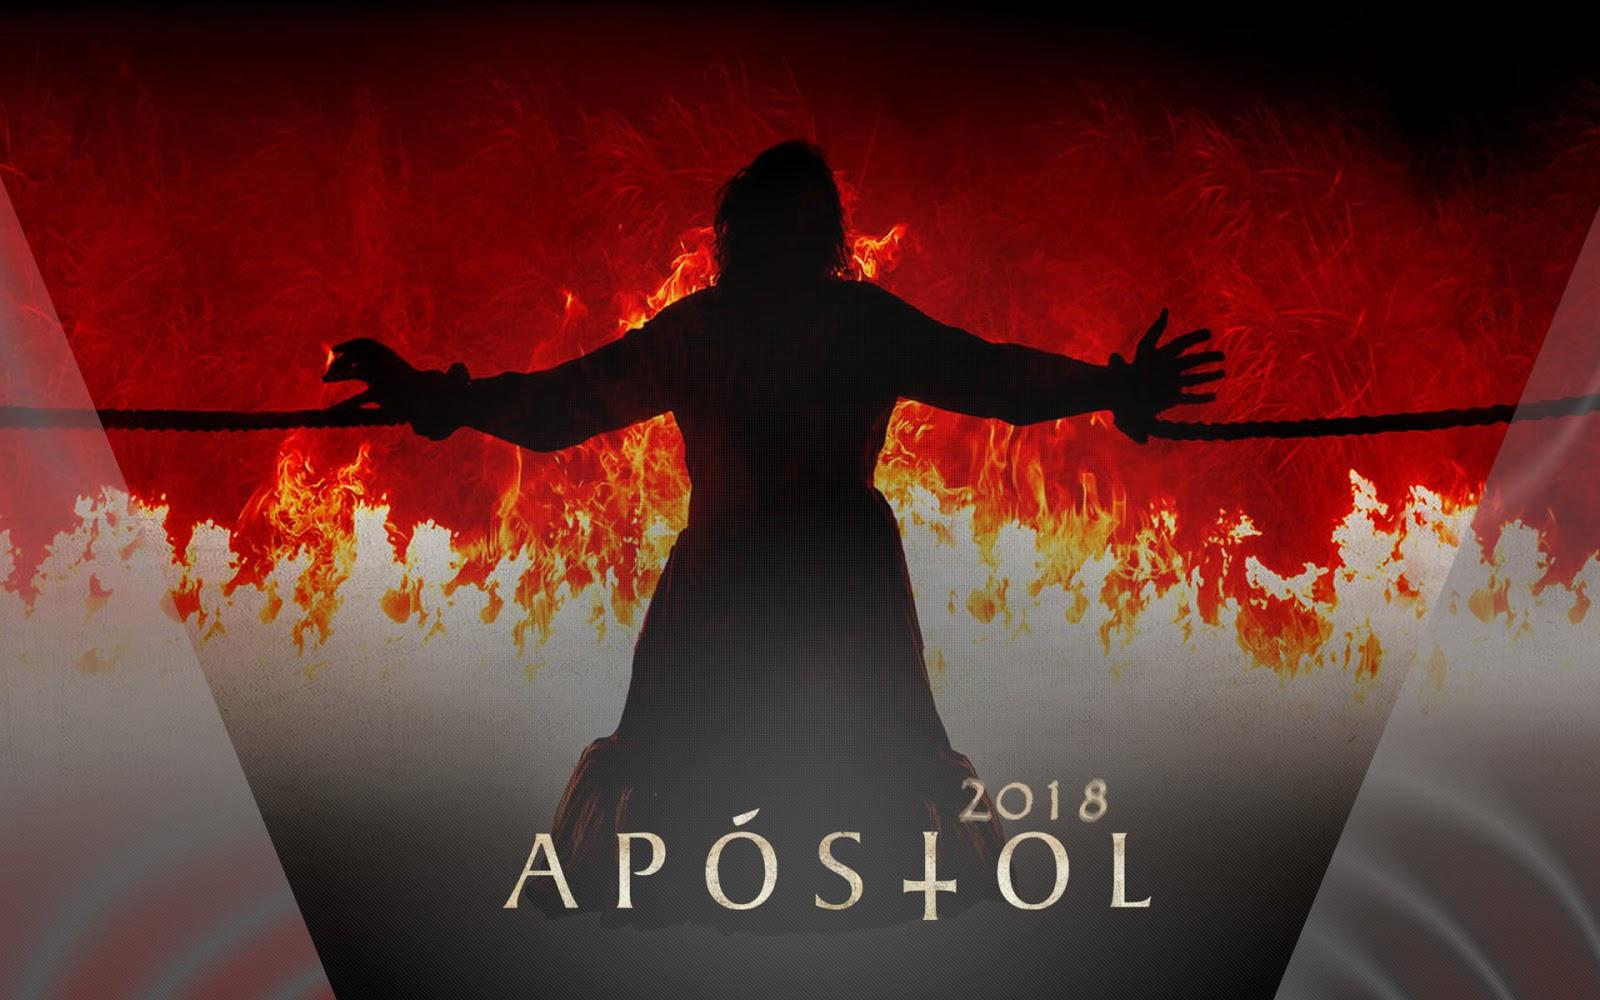 Ver El Apóstol Pelicula 2018 Online Completa HD Gratis